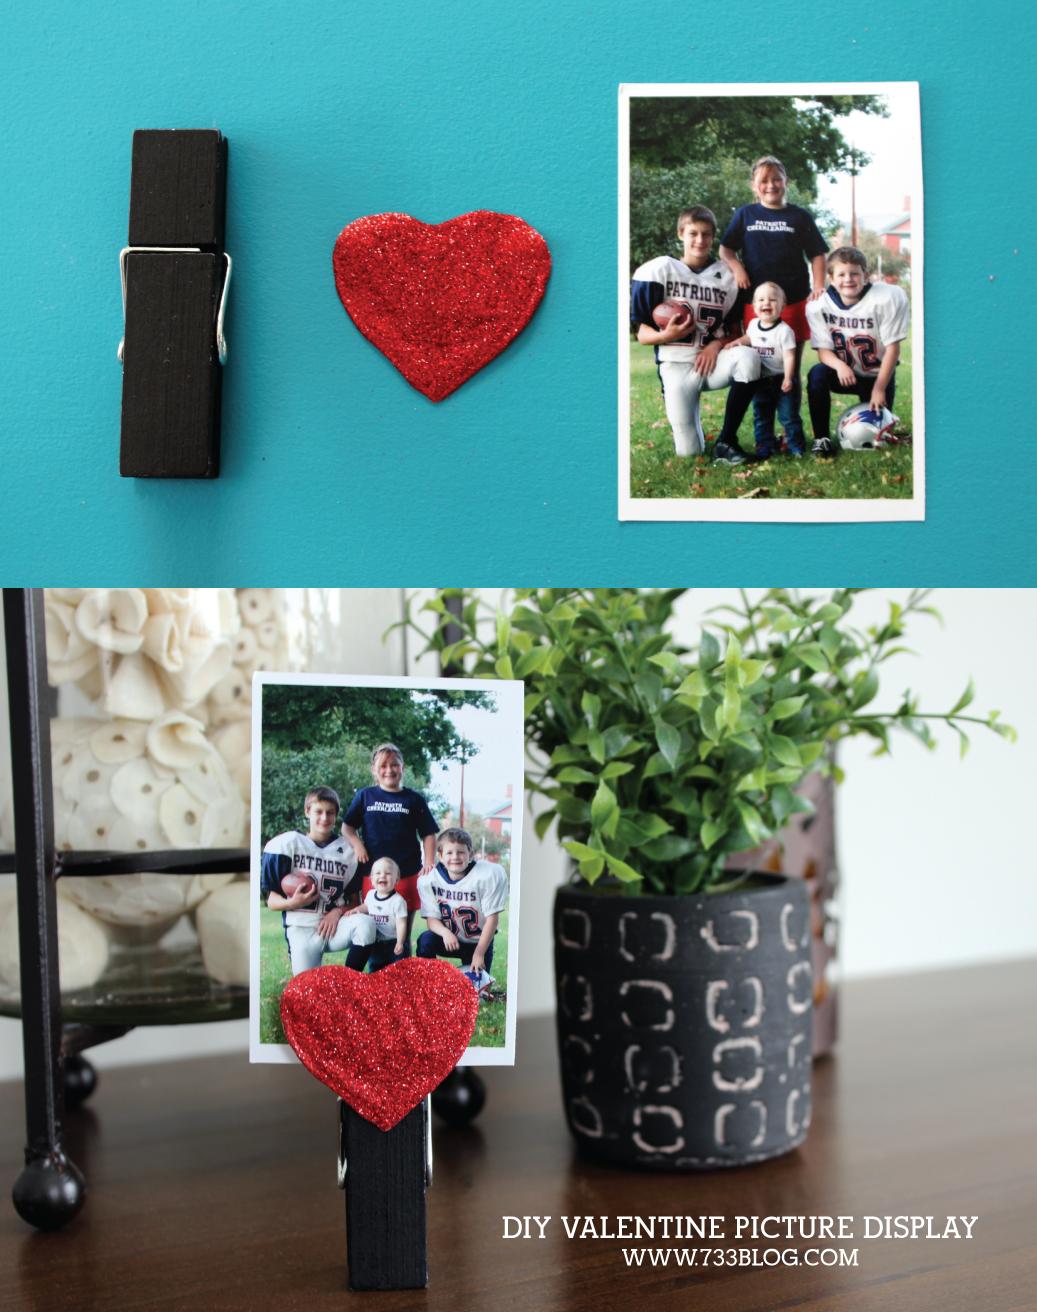 DIY Valentine Kids Craft Picture Display Tutorial